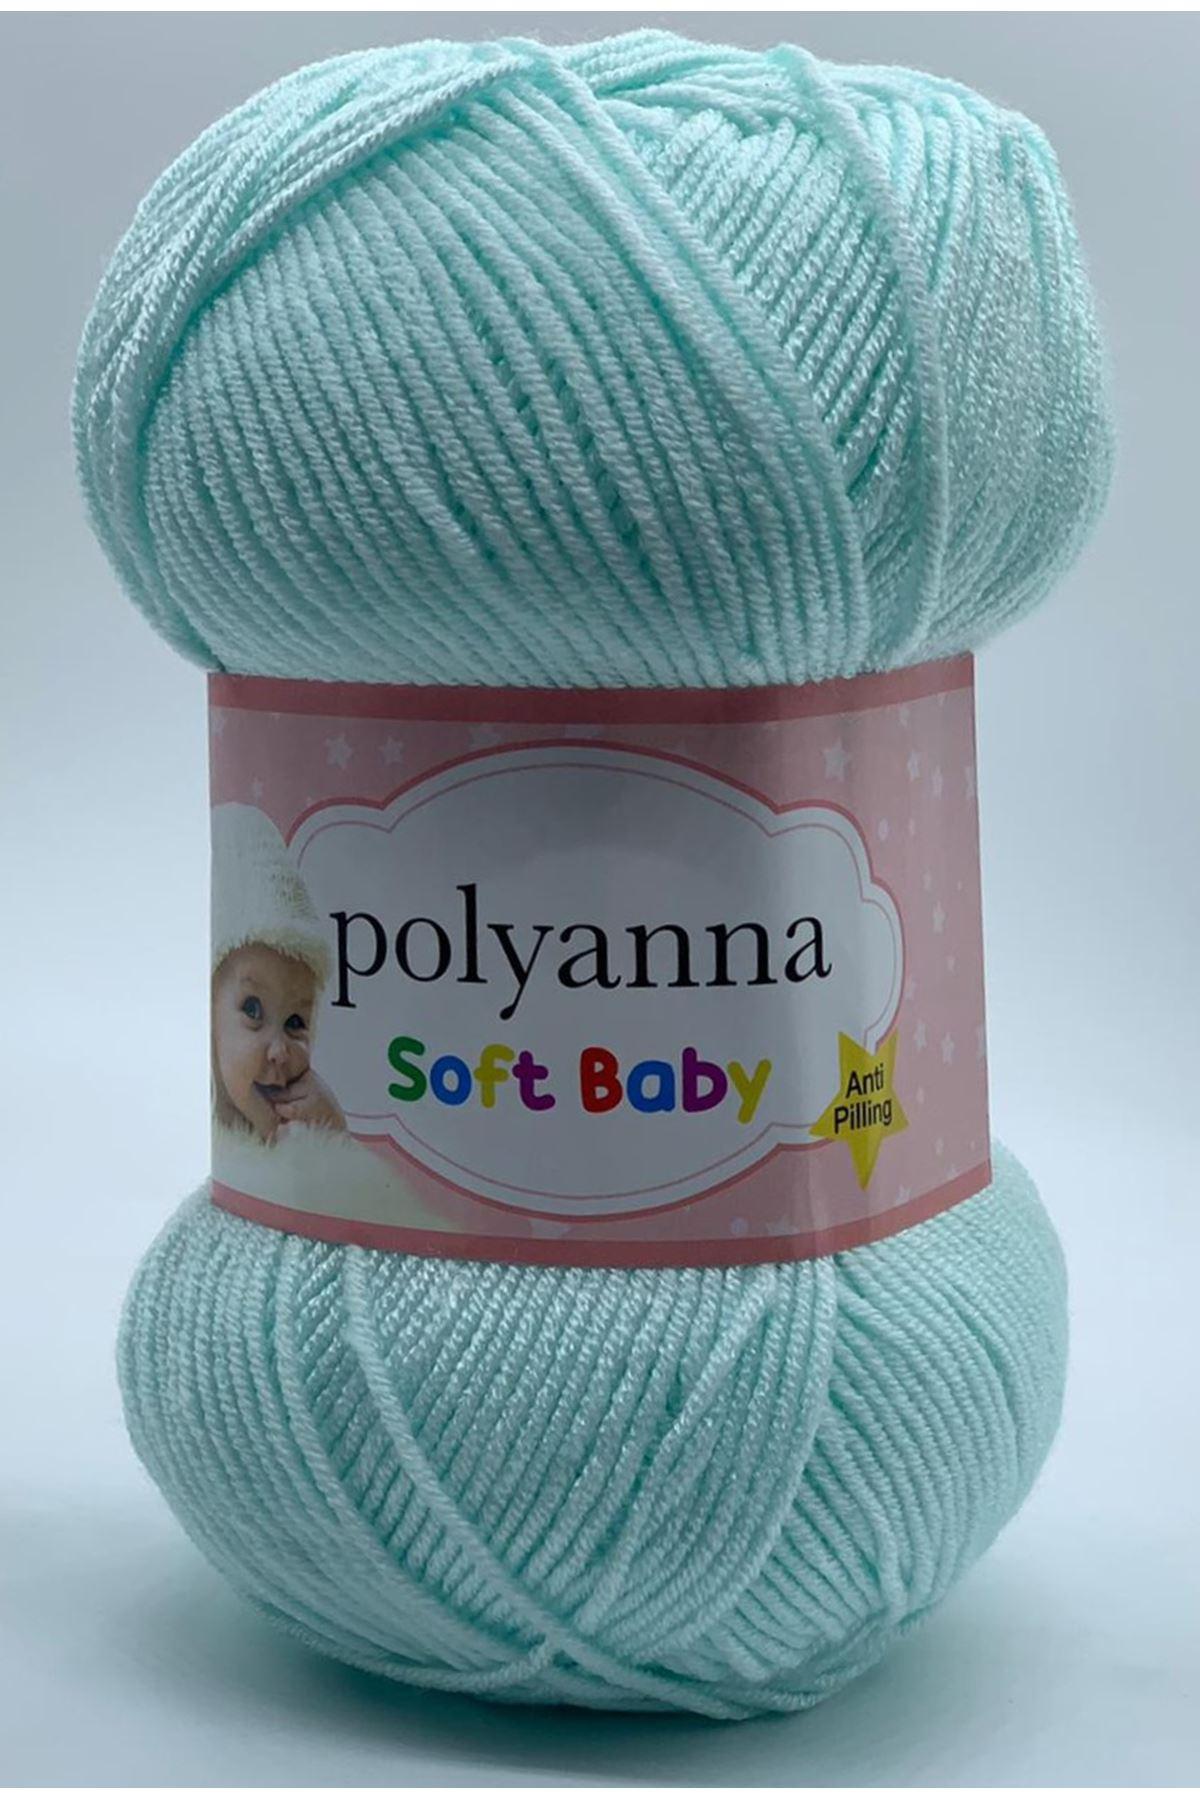 Polyanna Soft Baby 919 - Bebe Yeşil